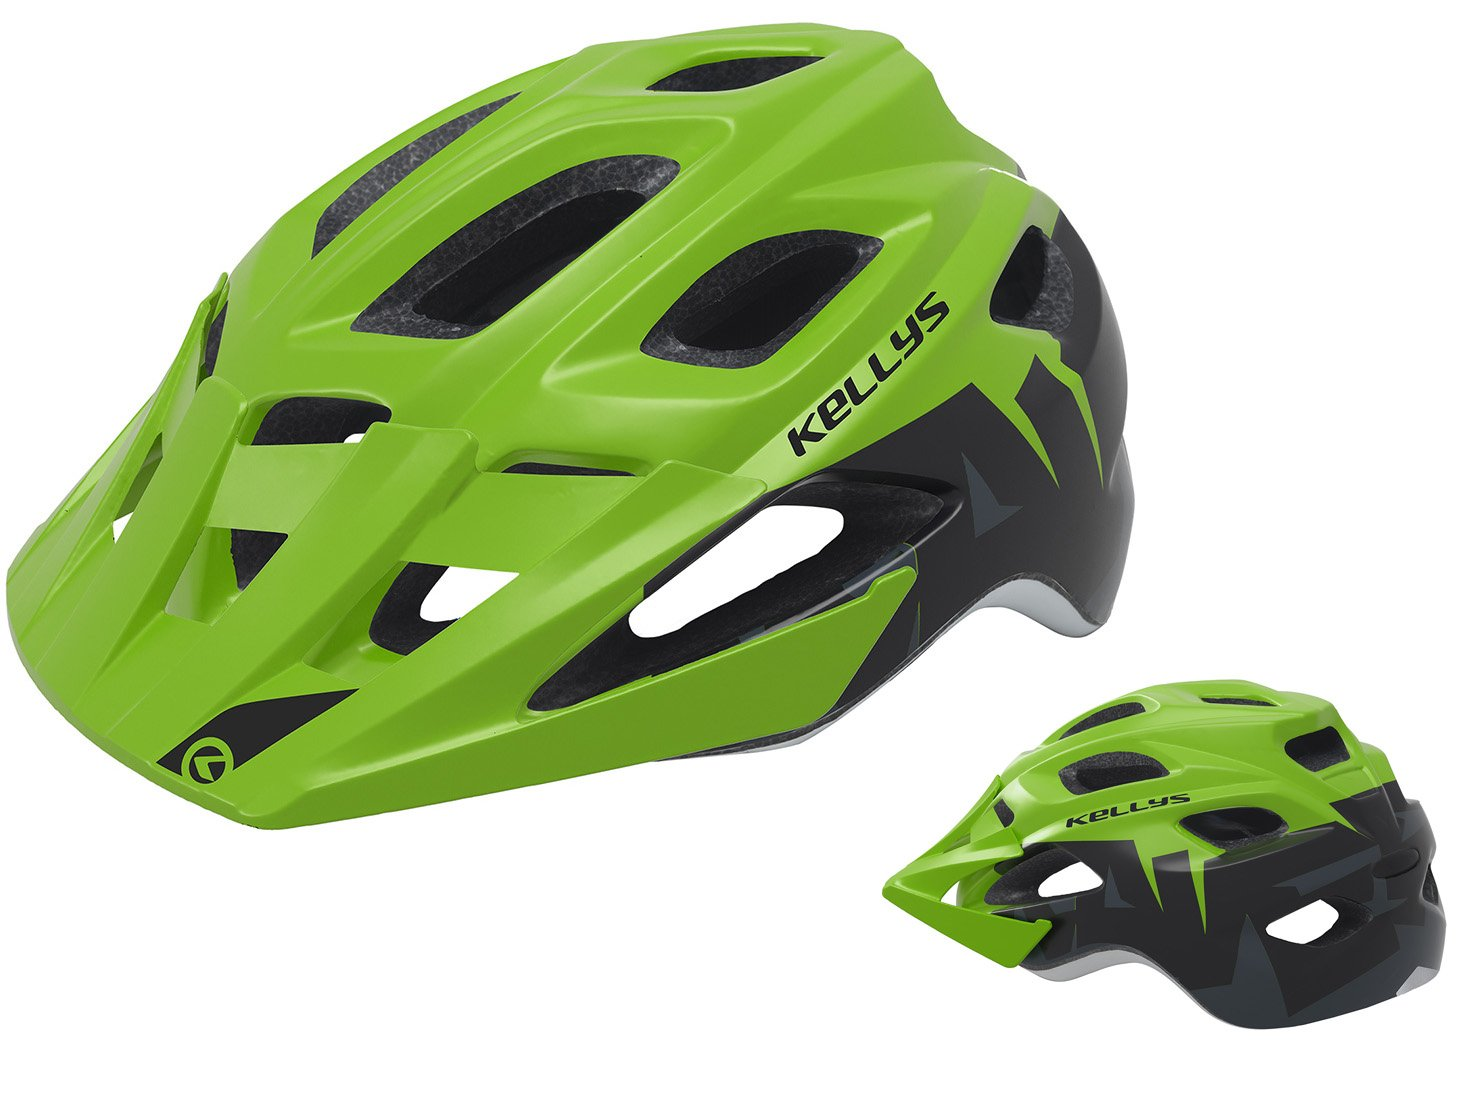 Шлем велосипедный KELLYS RAVE для MTB, матовый зелёный (Размер: M/L (60-64см))